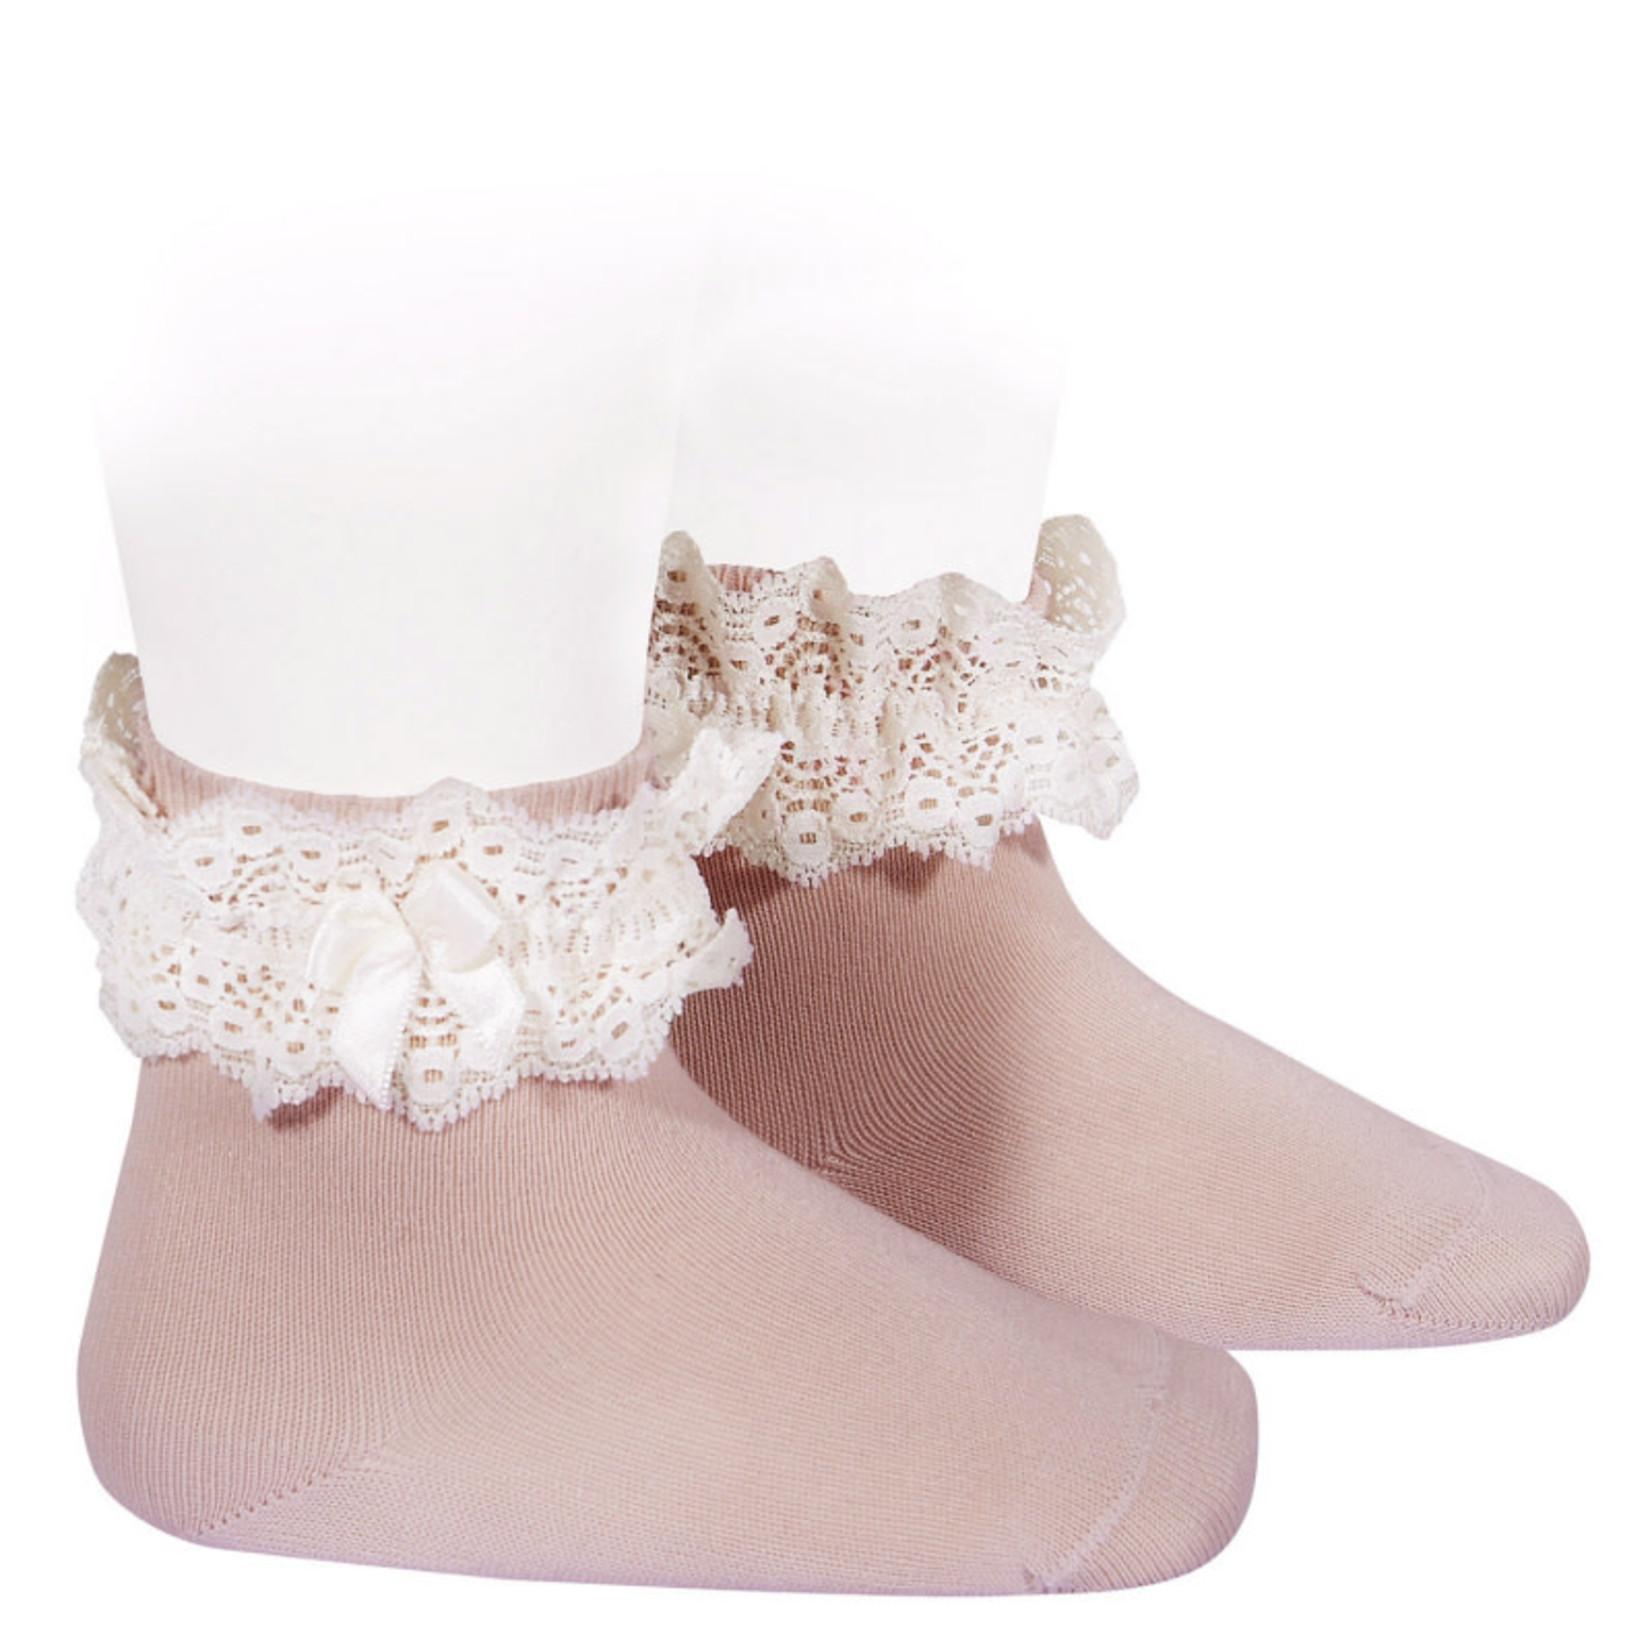 Socks Lace Trim - Pale Pink